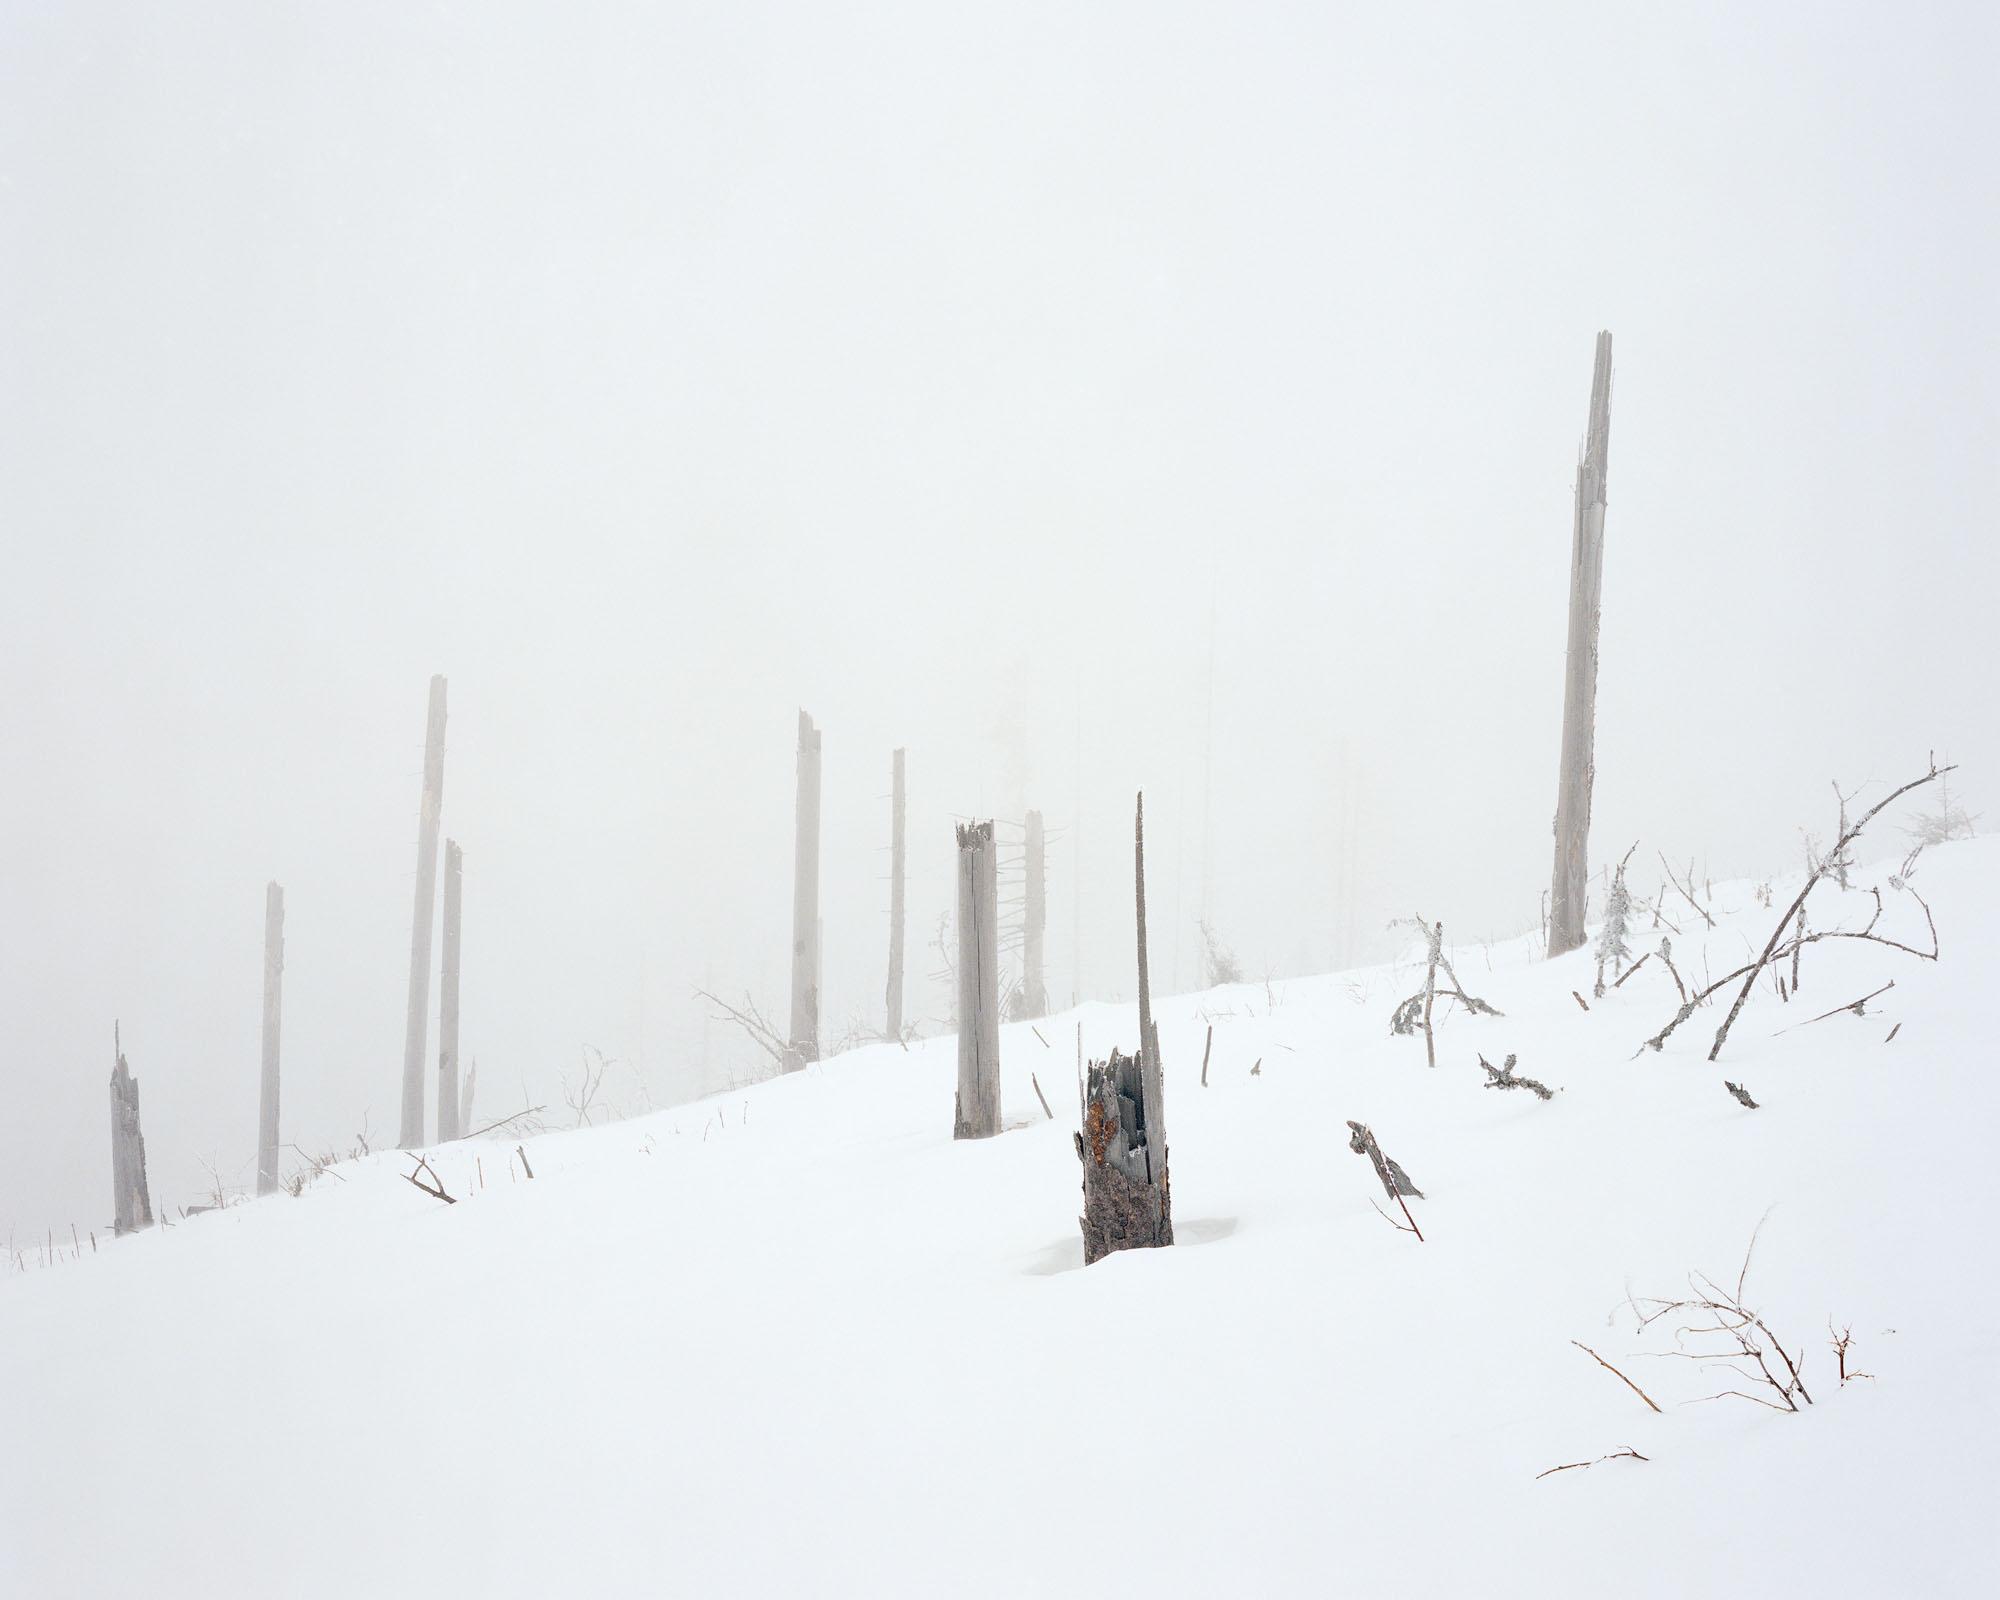 FF2019-white_n-image10